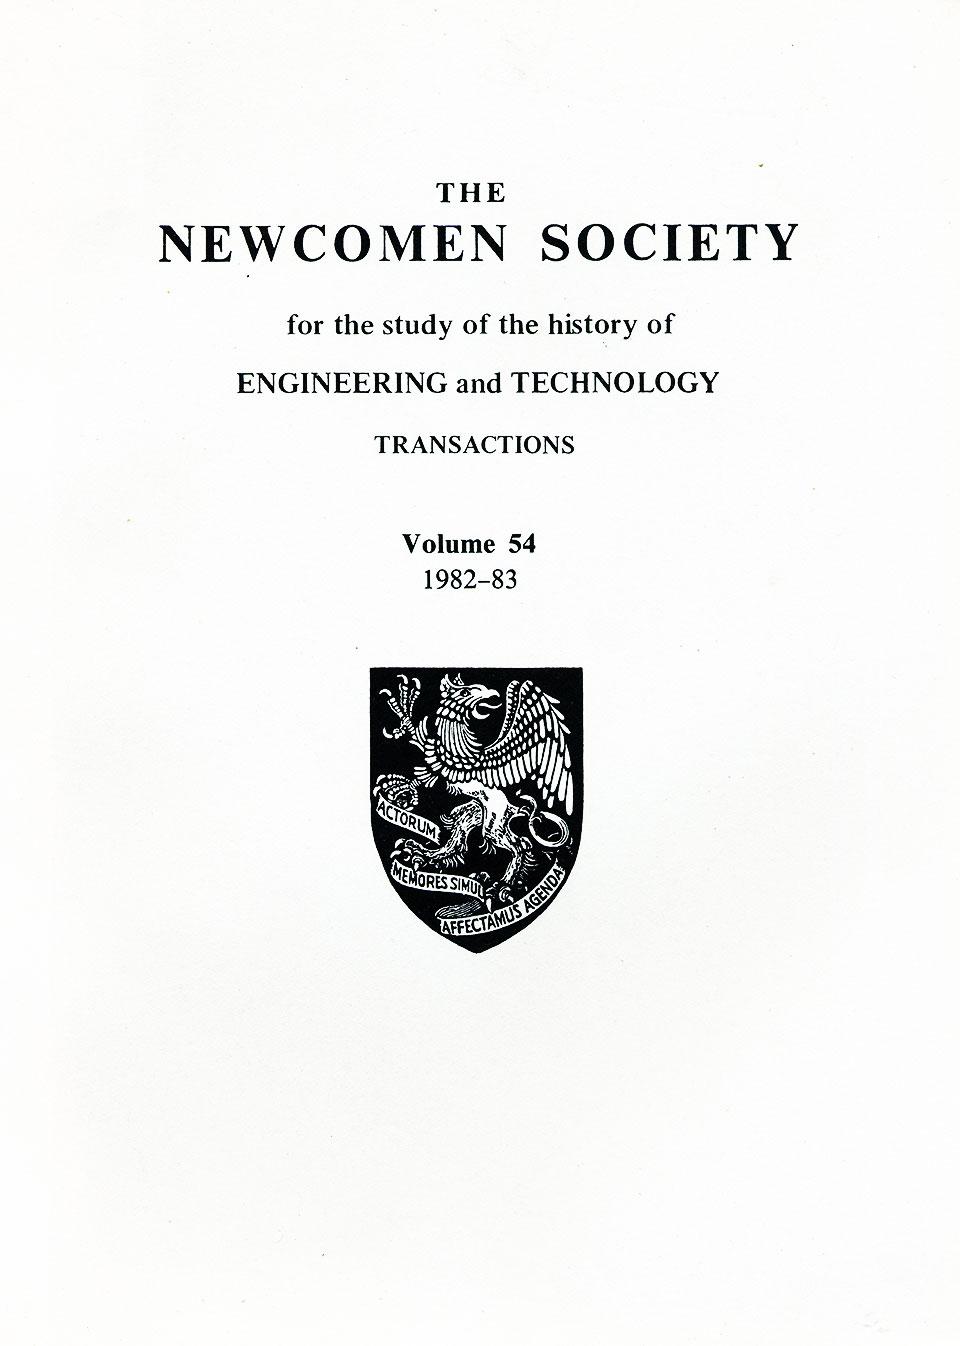 The Journal - V54 No1 1982-83 - cover Paperback